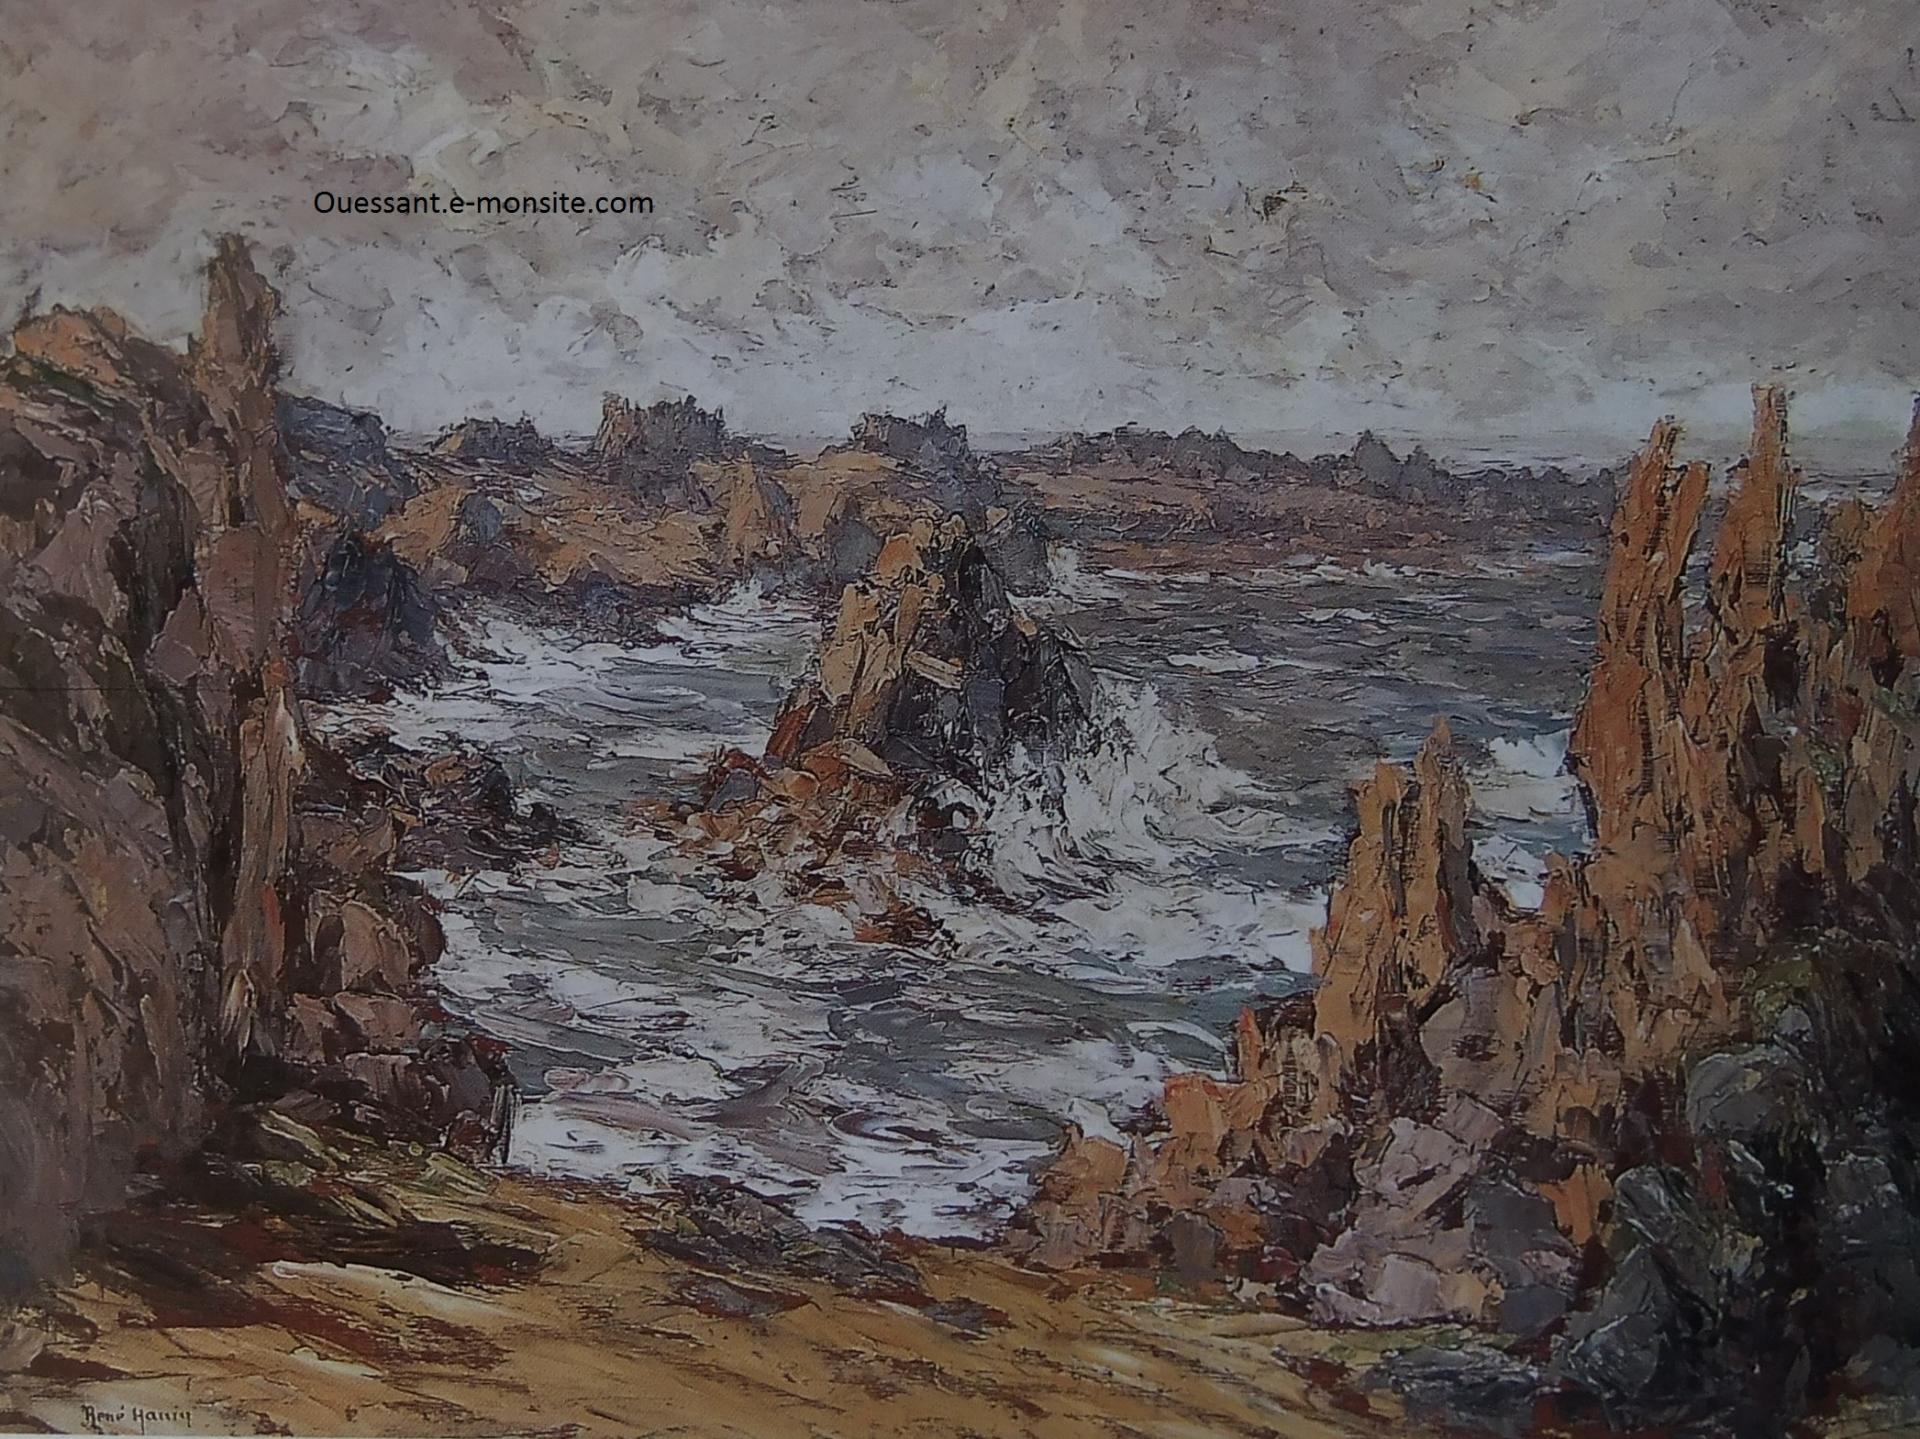 René HANIN Ouessant